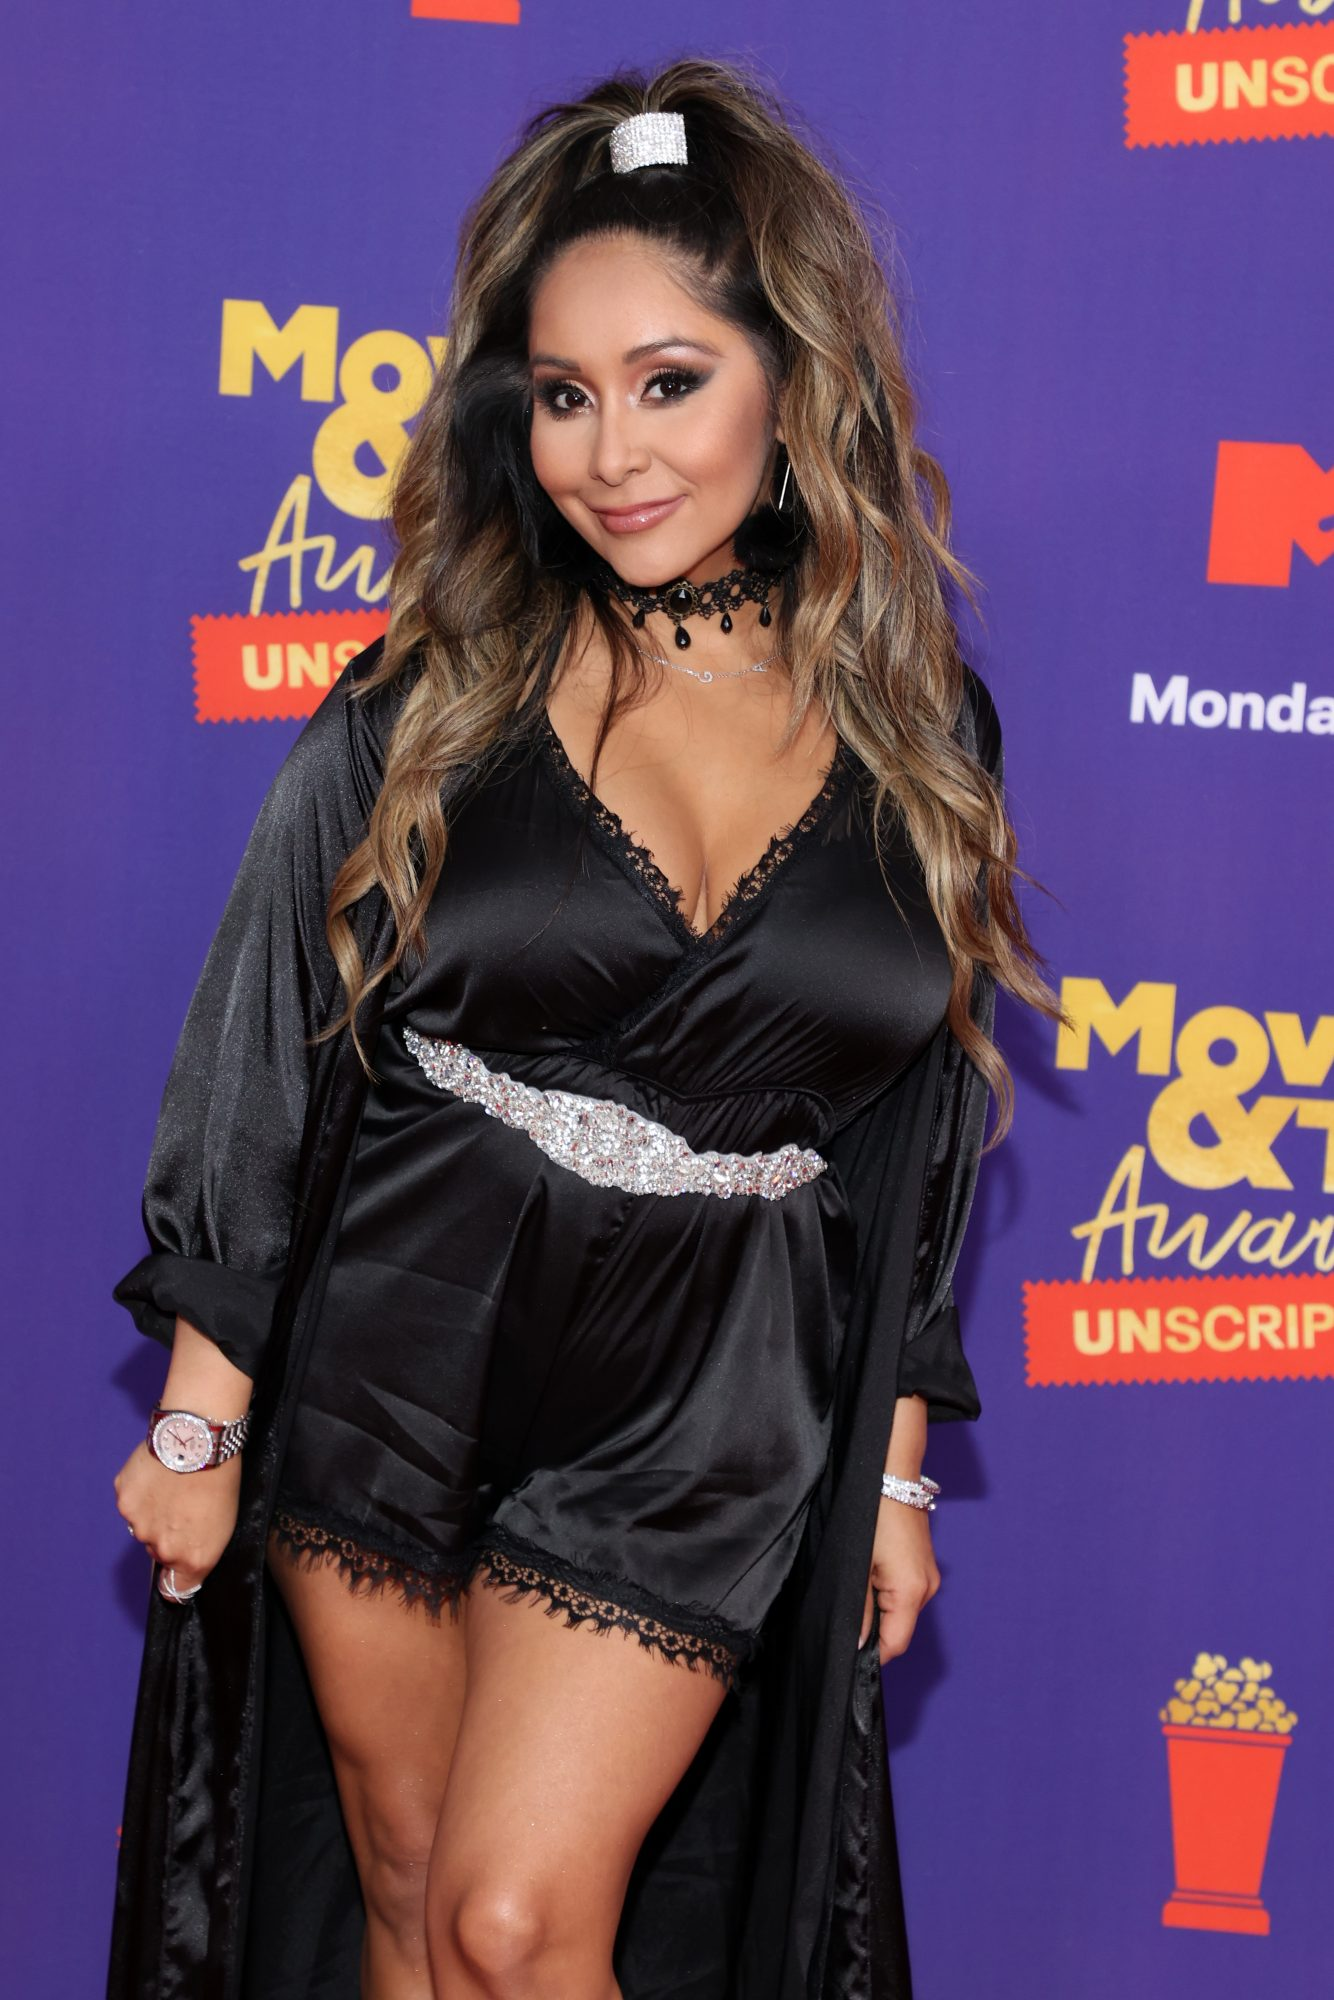 MTV Movie & Television Awards, Snooki, Nicole Polizzi